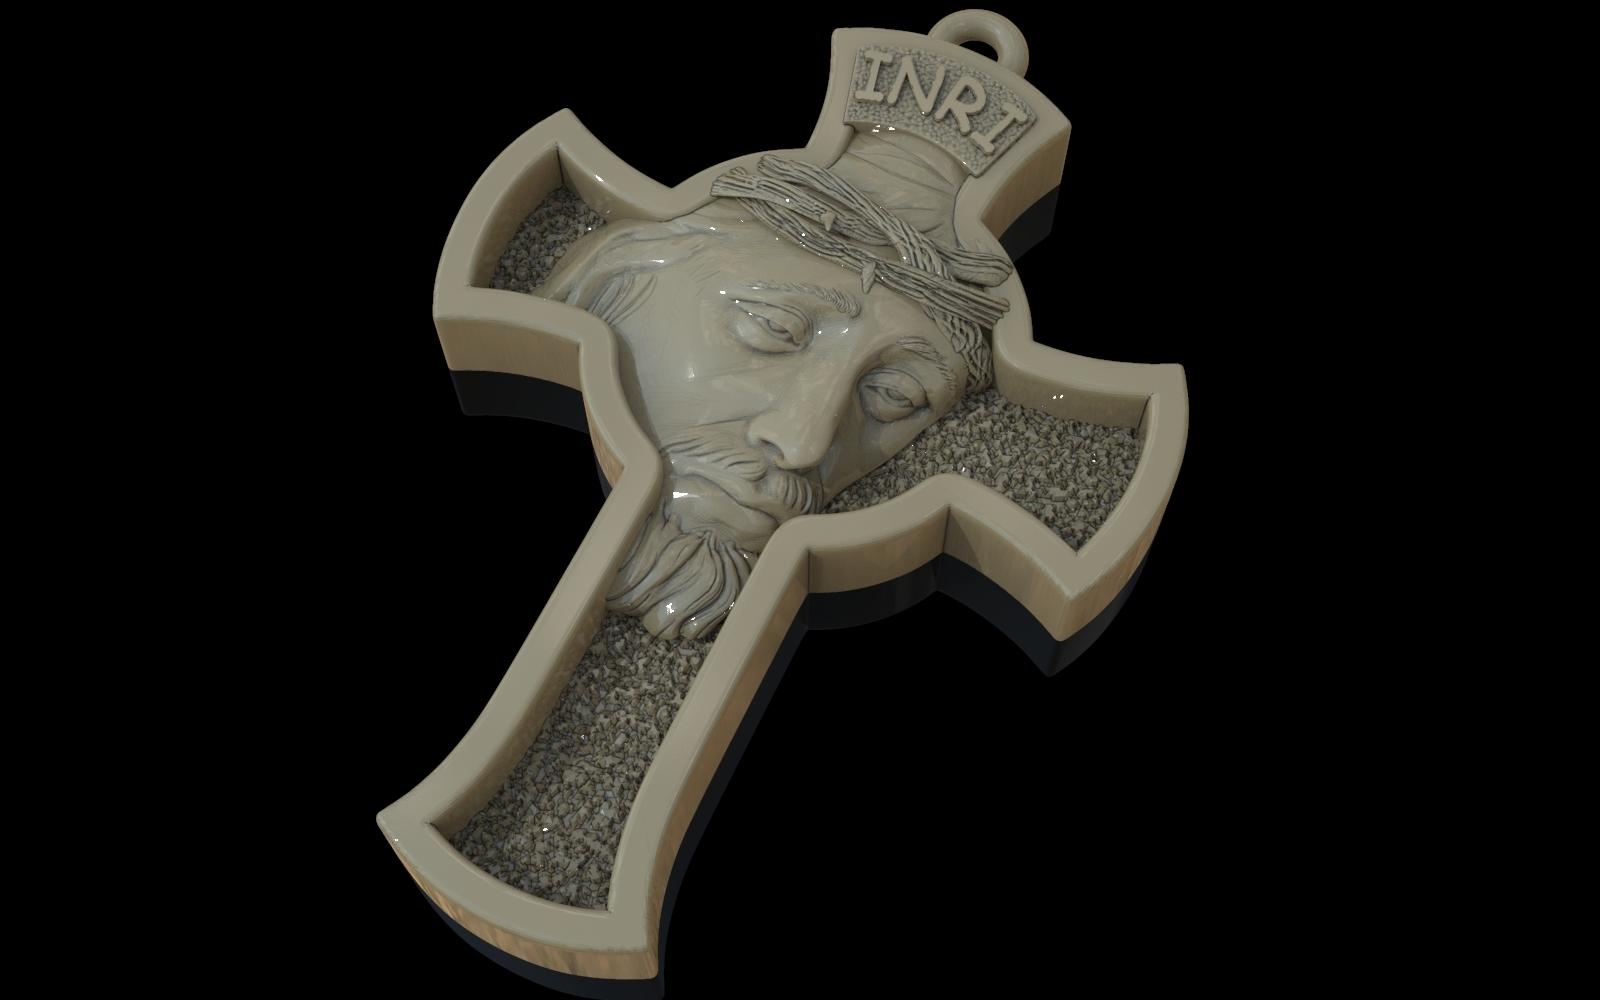 2.jpg Download free STL file Jesus Cross pendant medallion jewelry 3D print model • 3D printable object, Cadagency